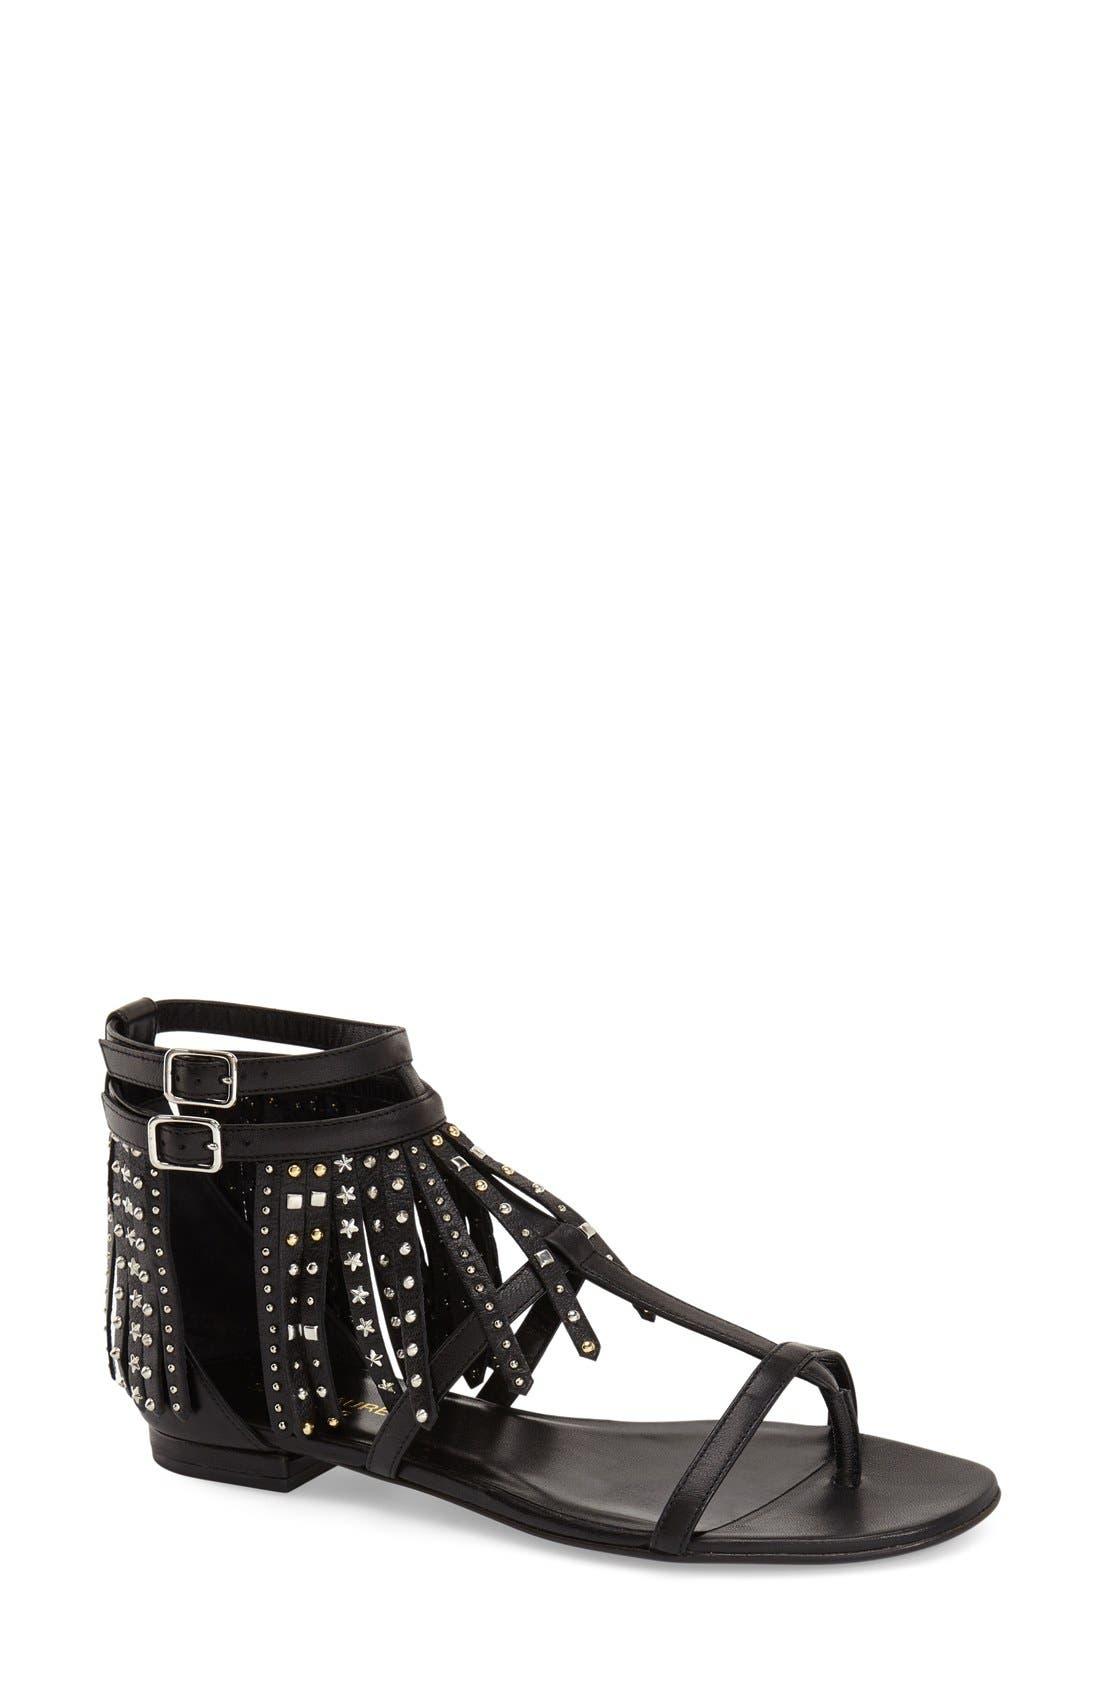 Main Image - Saint Laurent 'Nu' Studded Fringe Sandal (Women)